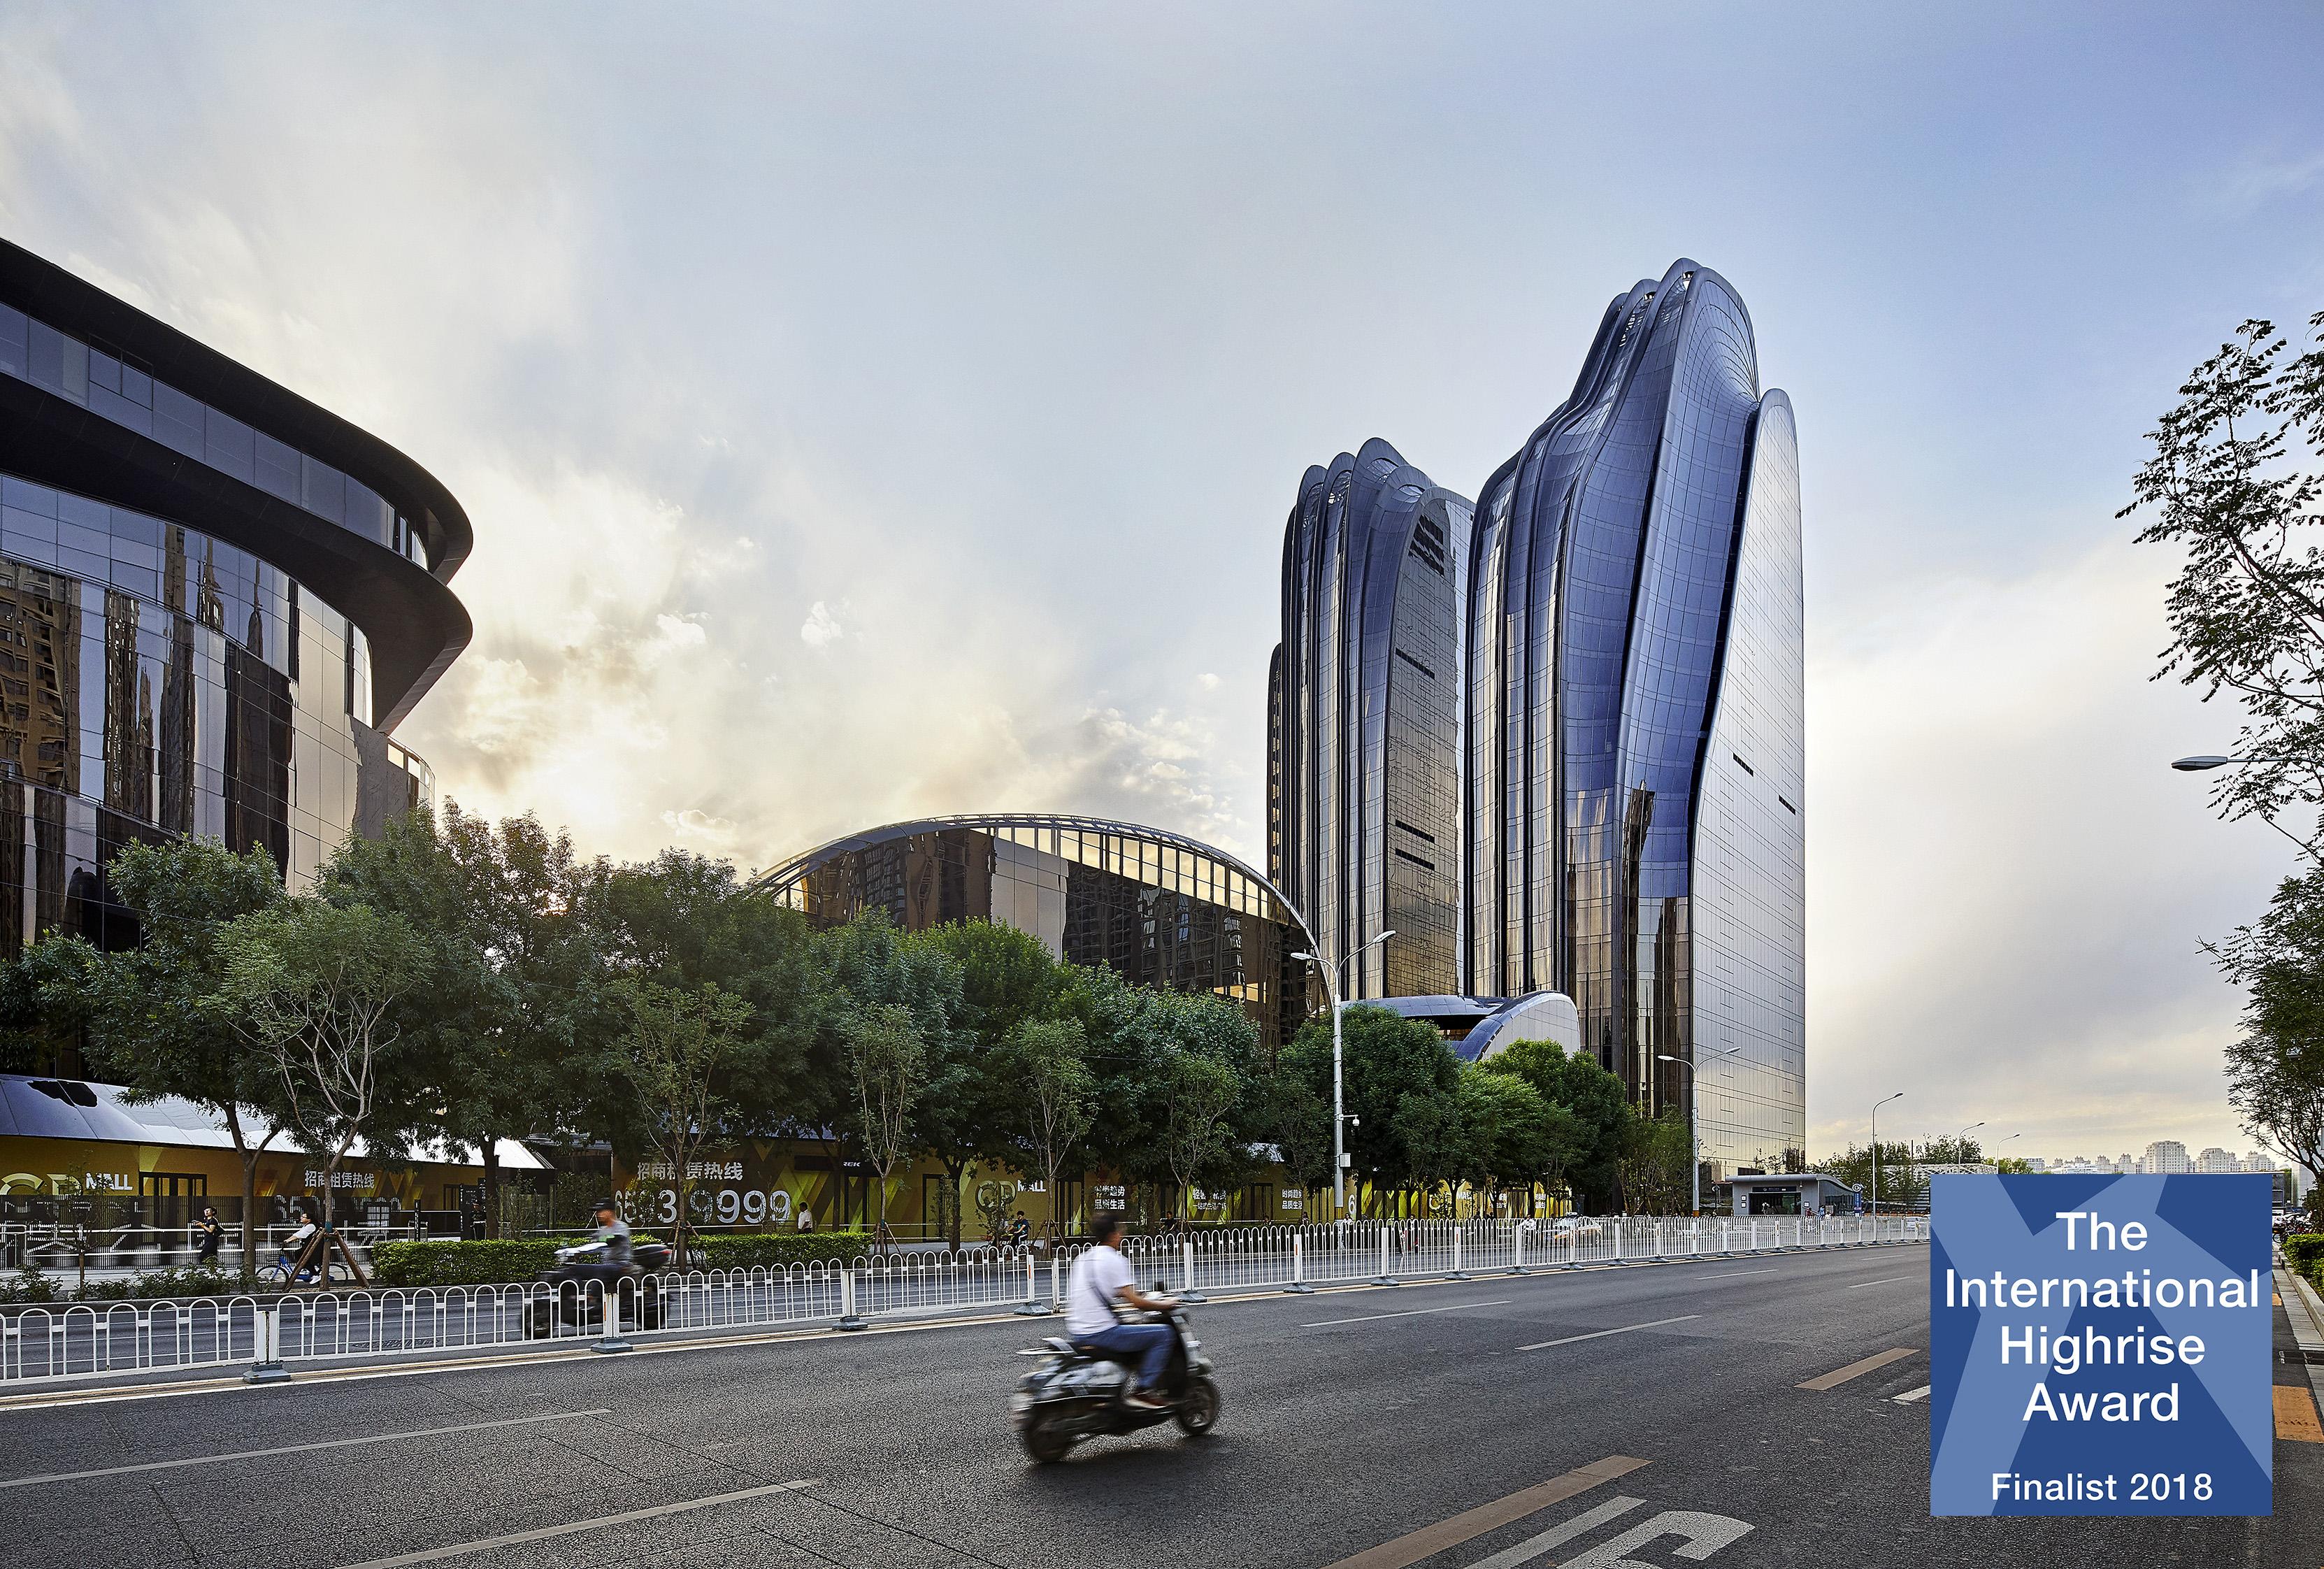 MAD_Chaoyang Park Plaza_©Hufton+Crow_IHA Finalist